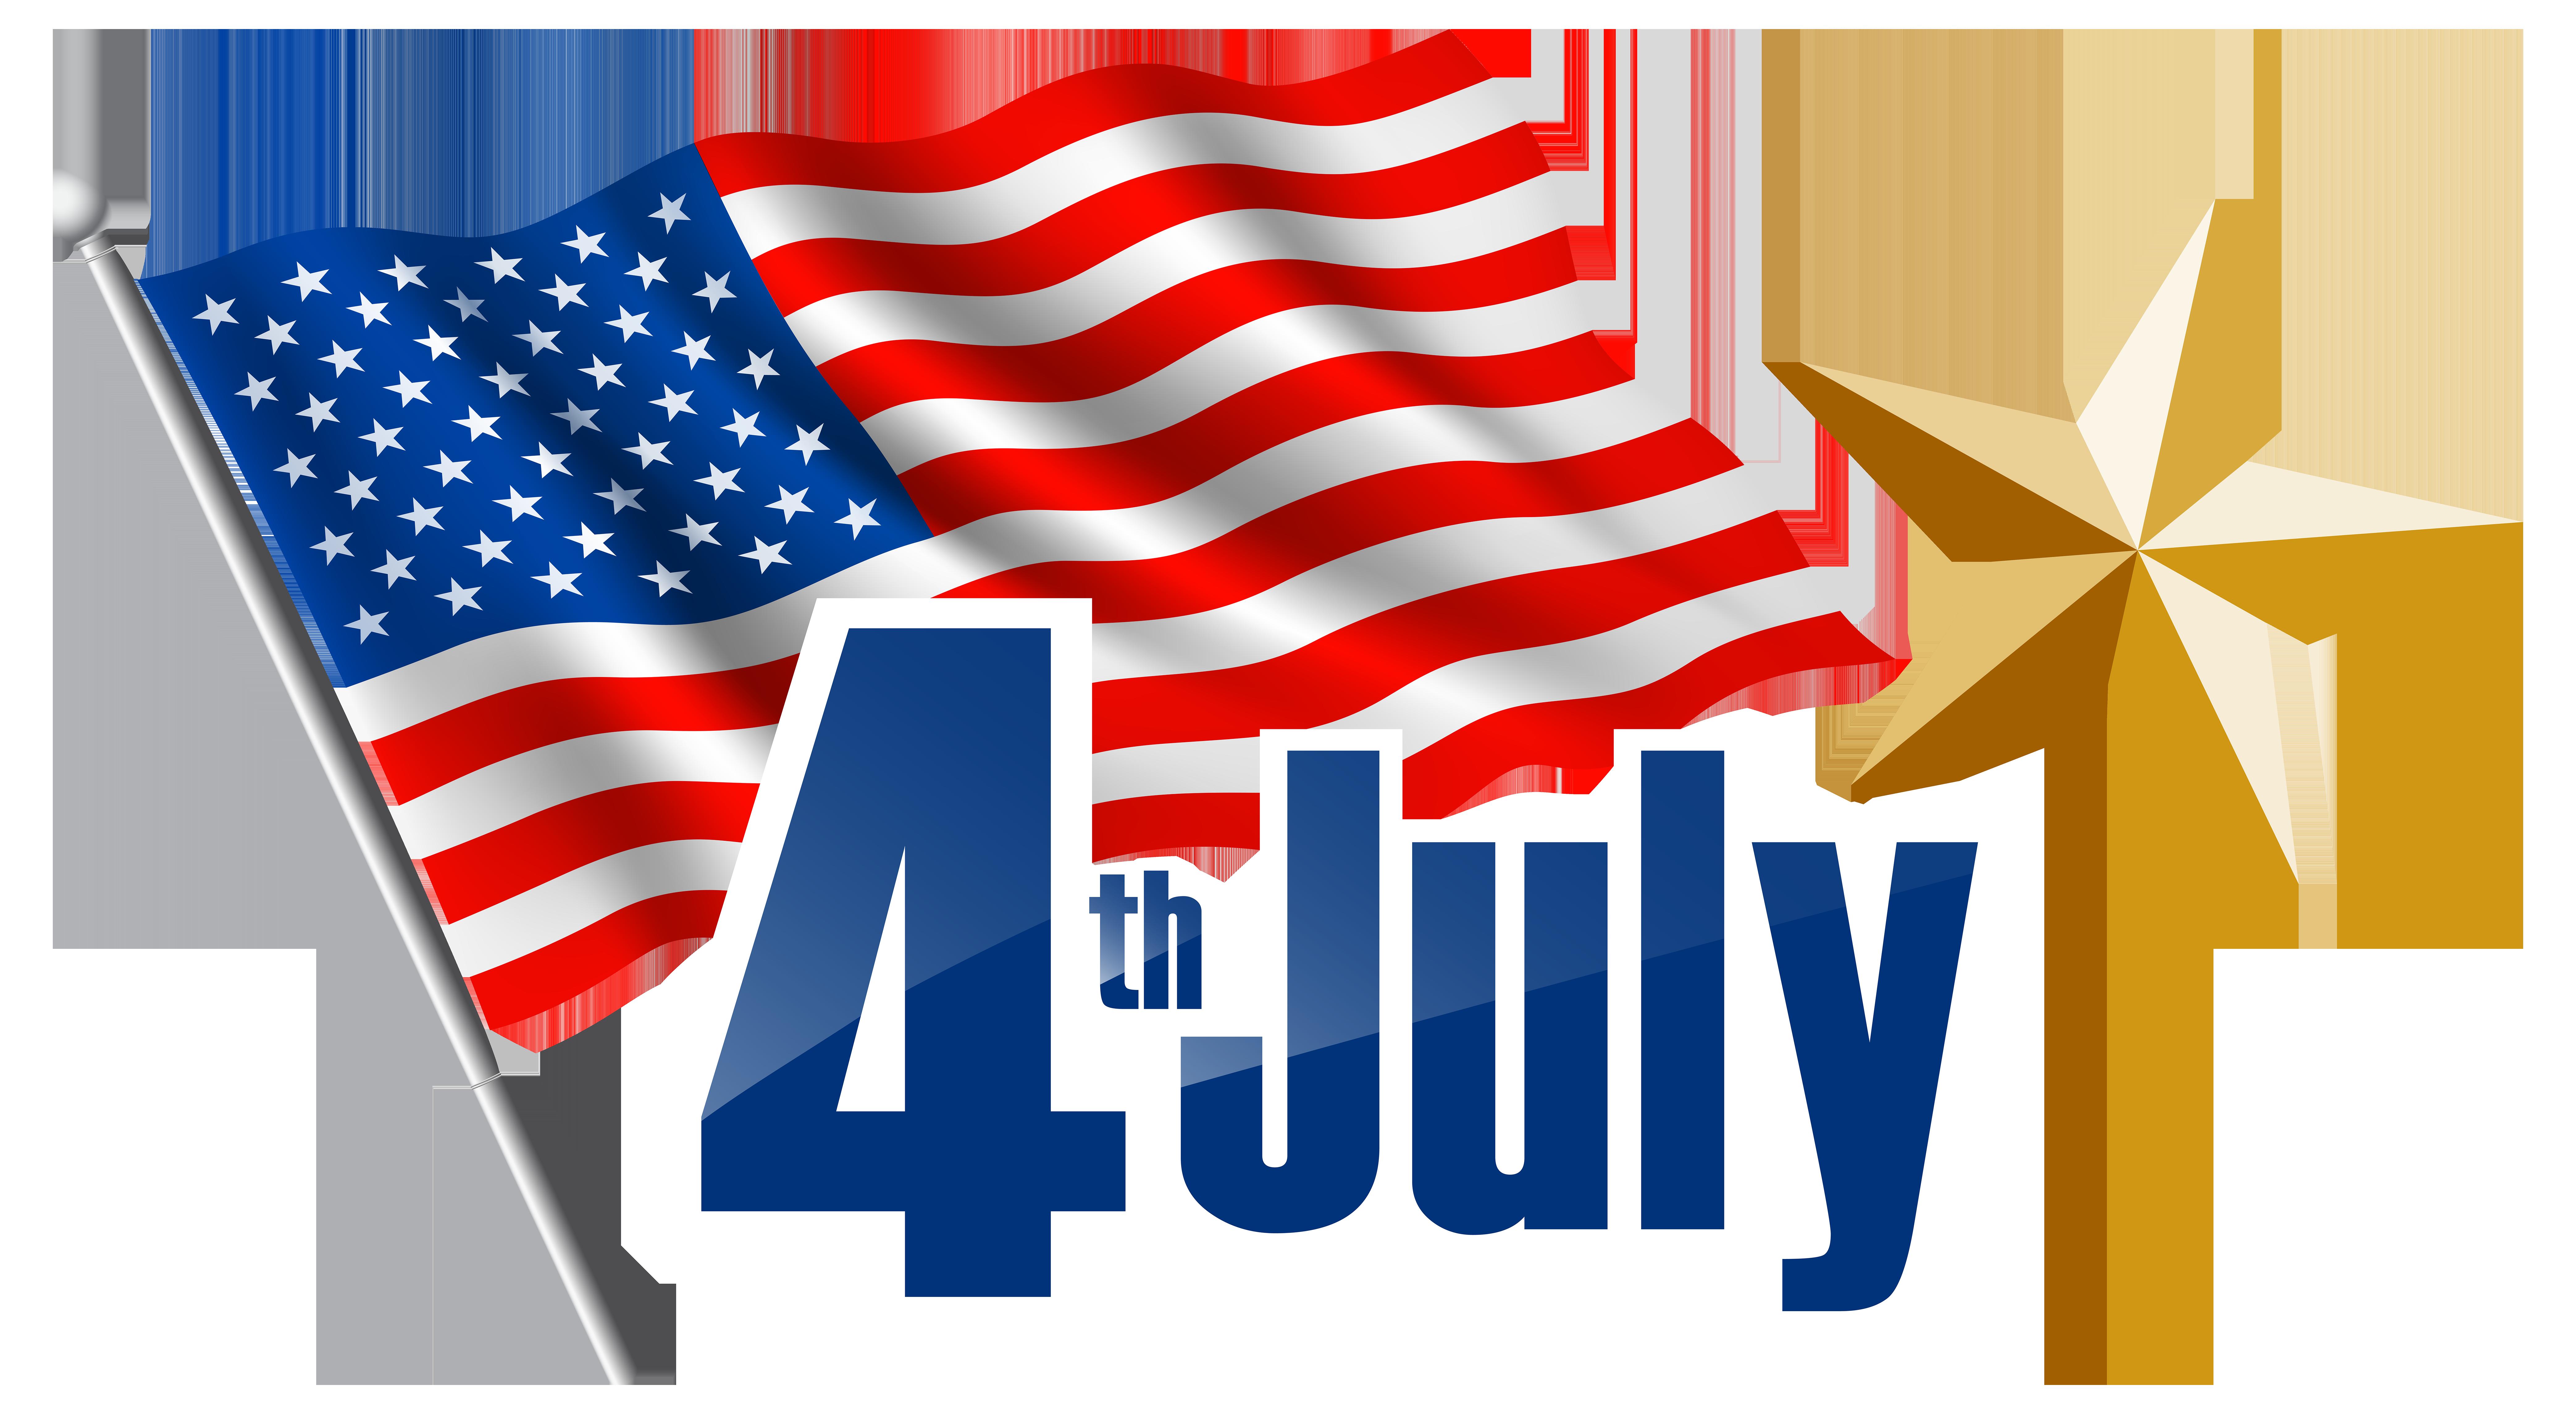 4th july transparent.